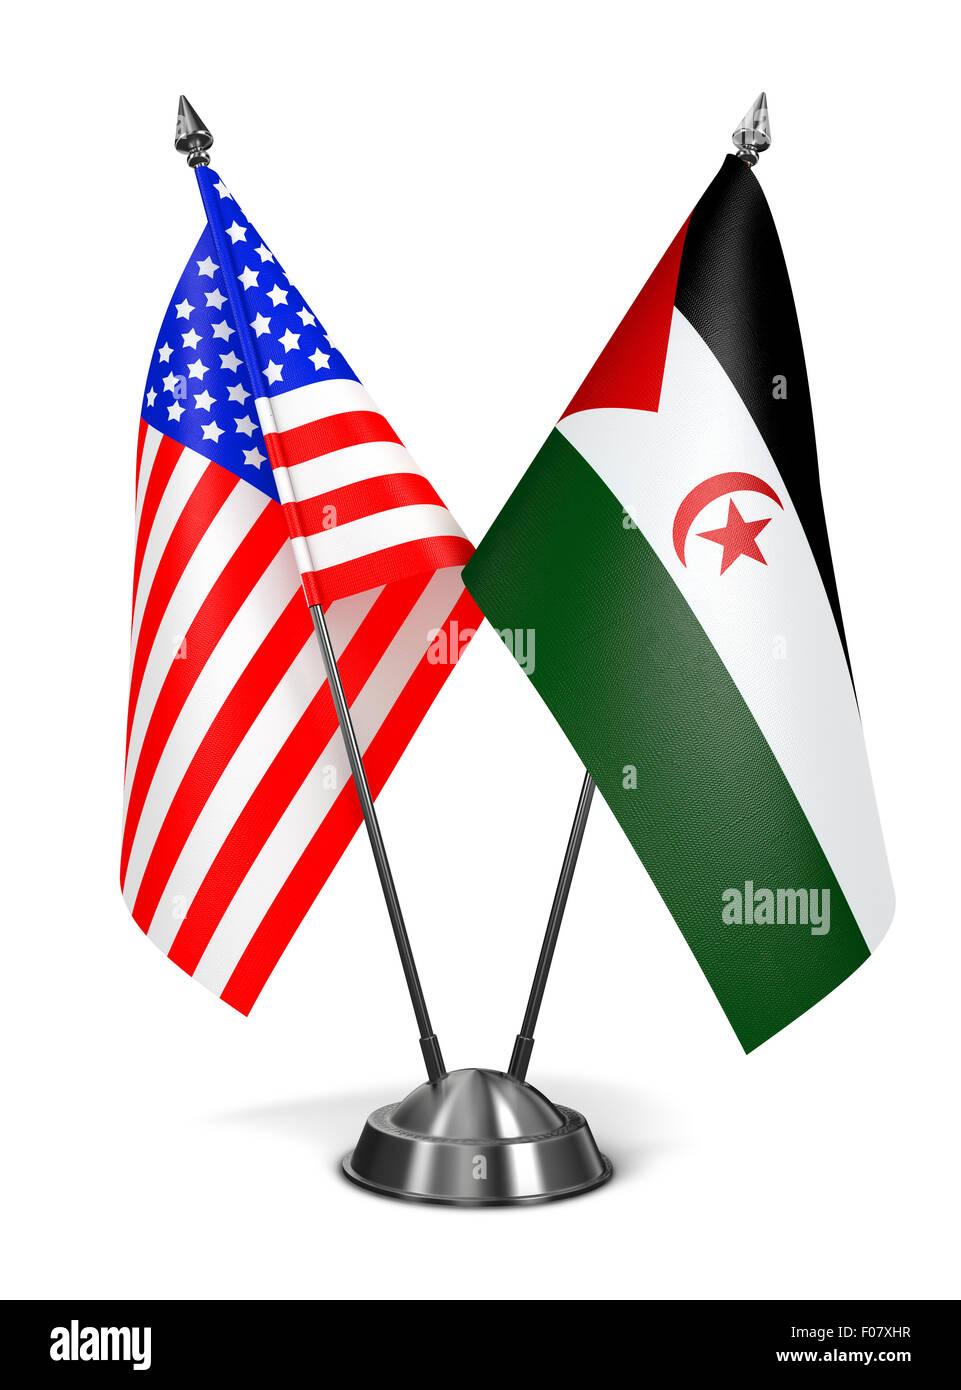 USA and Sahrawi Arab Democratic Republic - Miniature Flags. - Stock Image